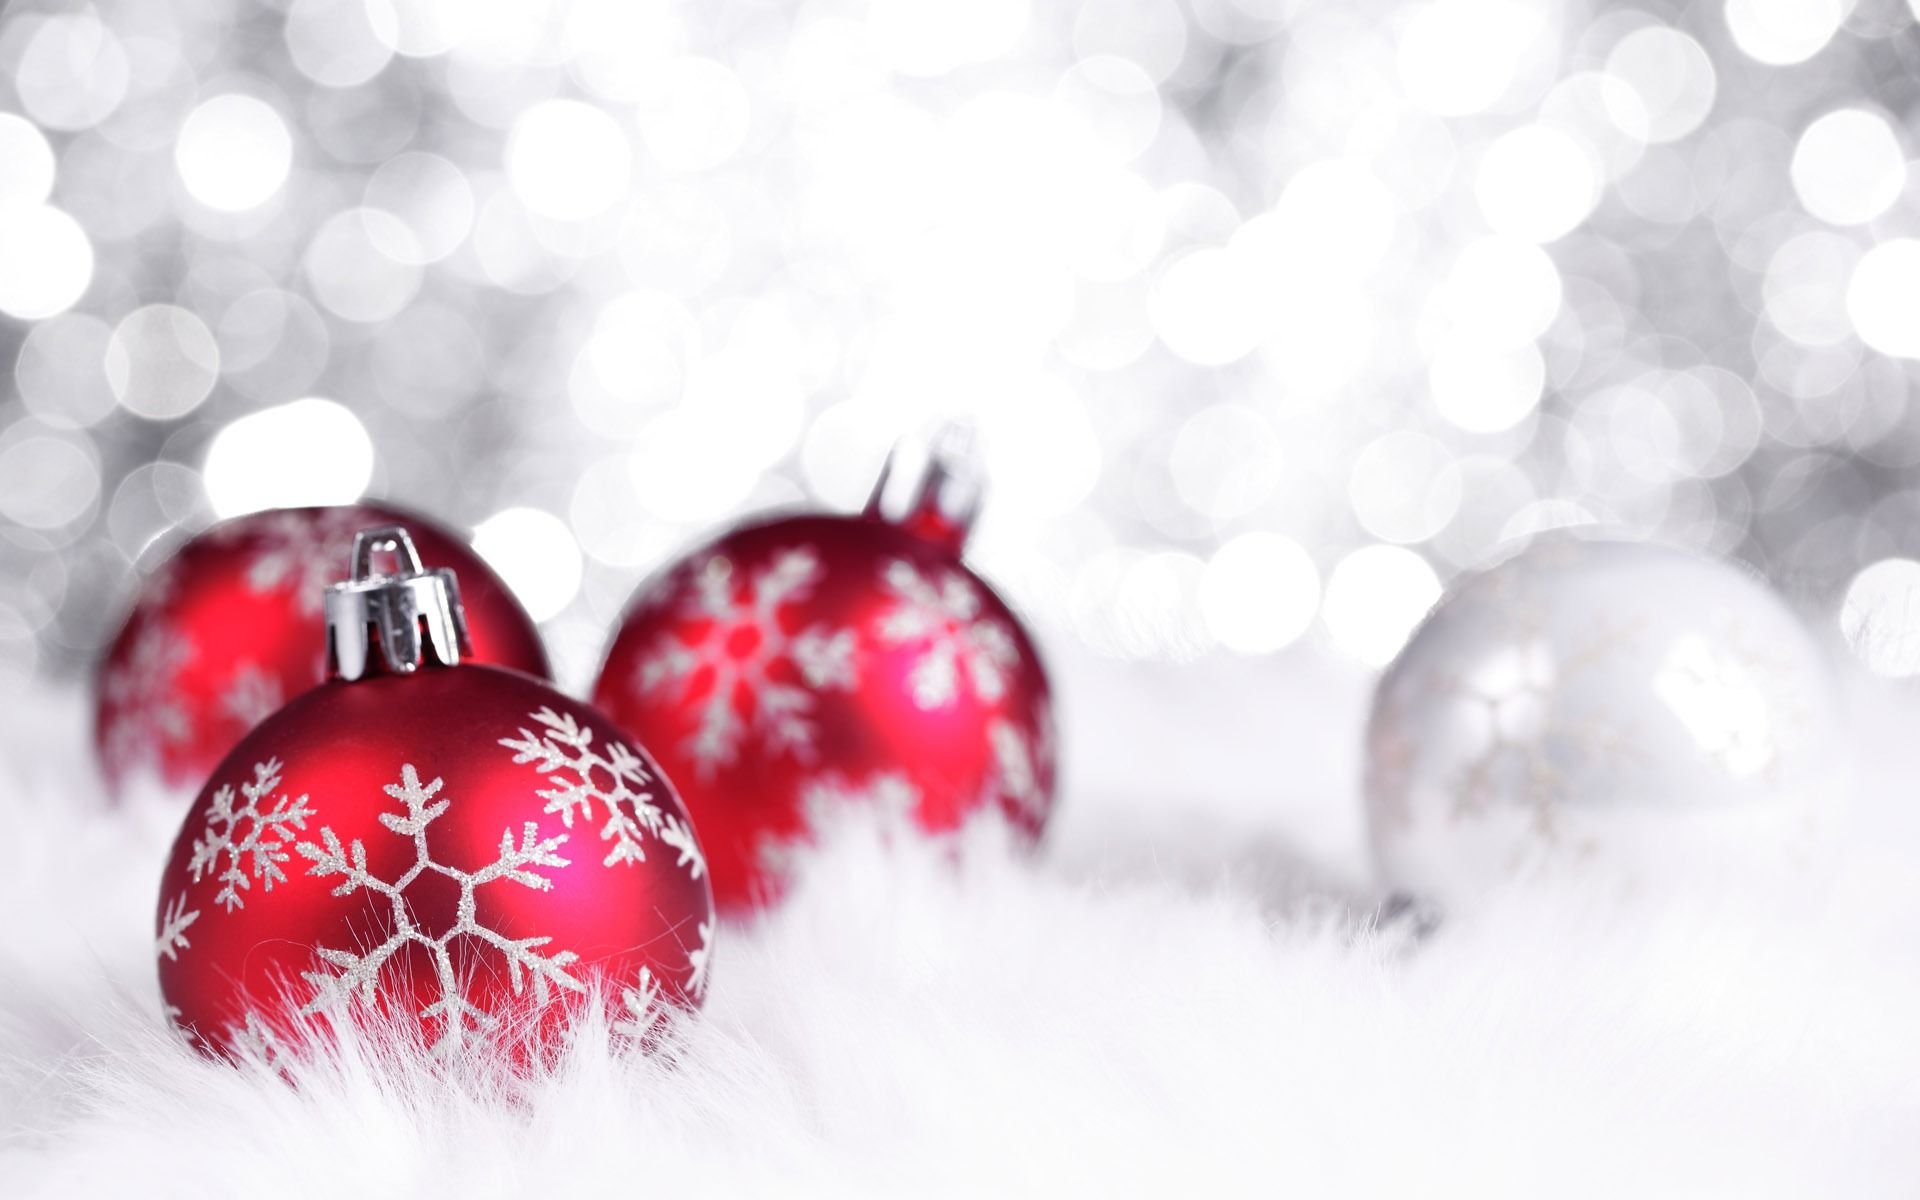 Christmas balls wallpapers | Desktop and Mobile Wallpapers ...